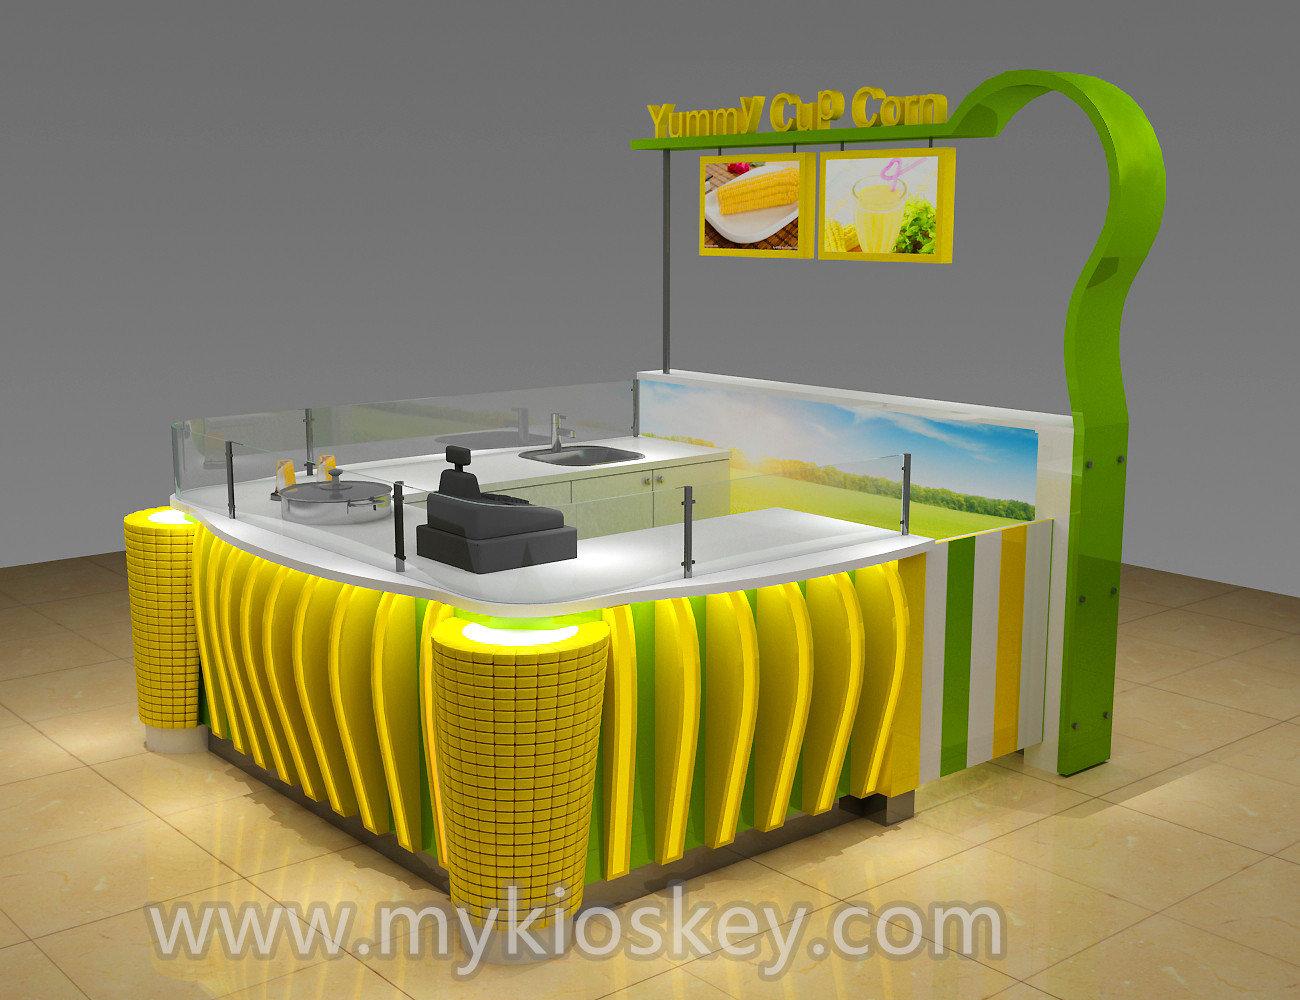 High end mini sweet corn kiosk design for sale for Designs for sale